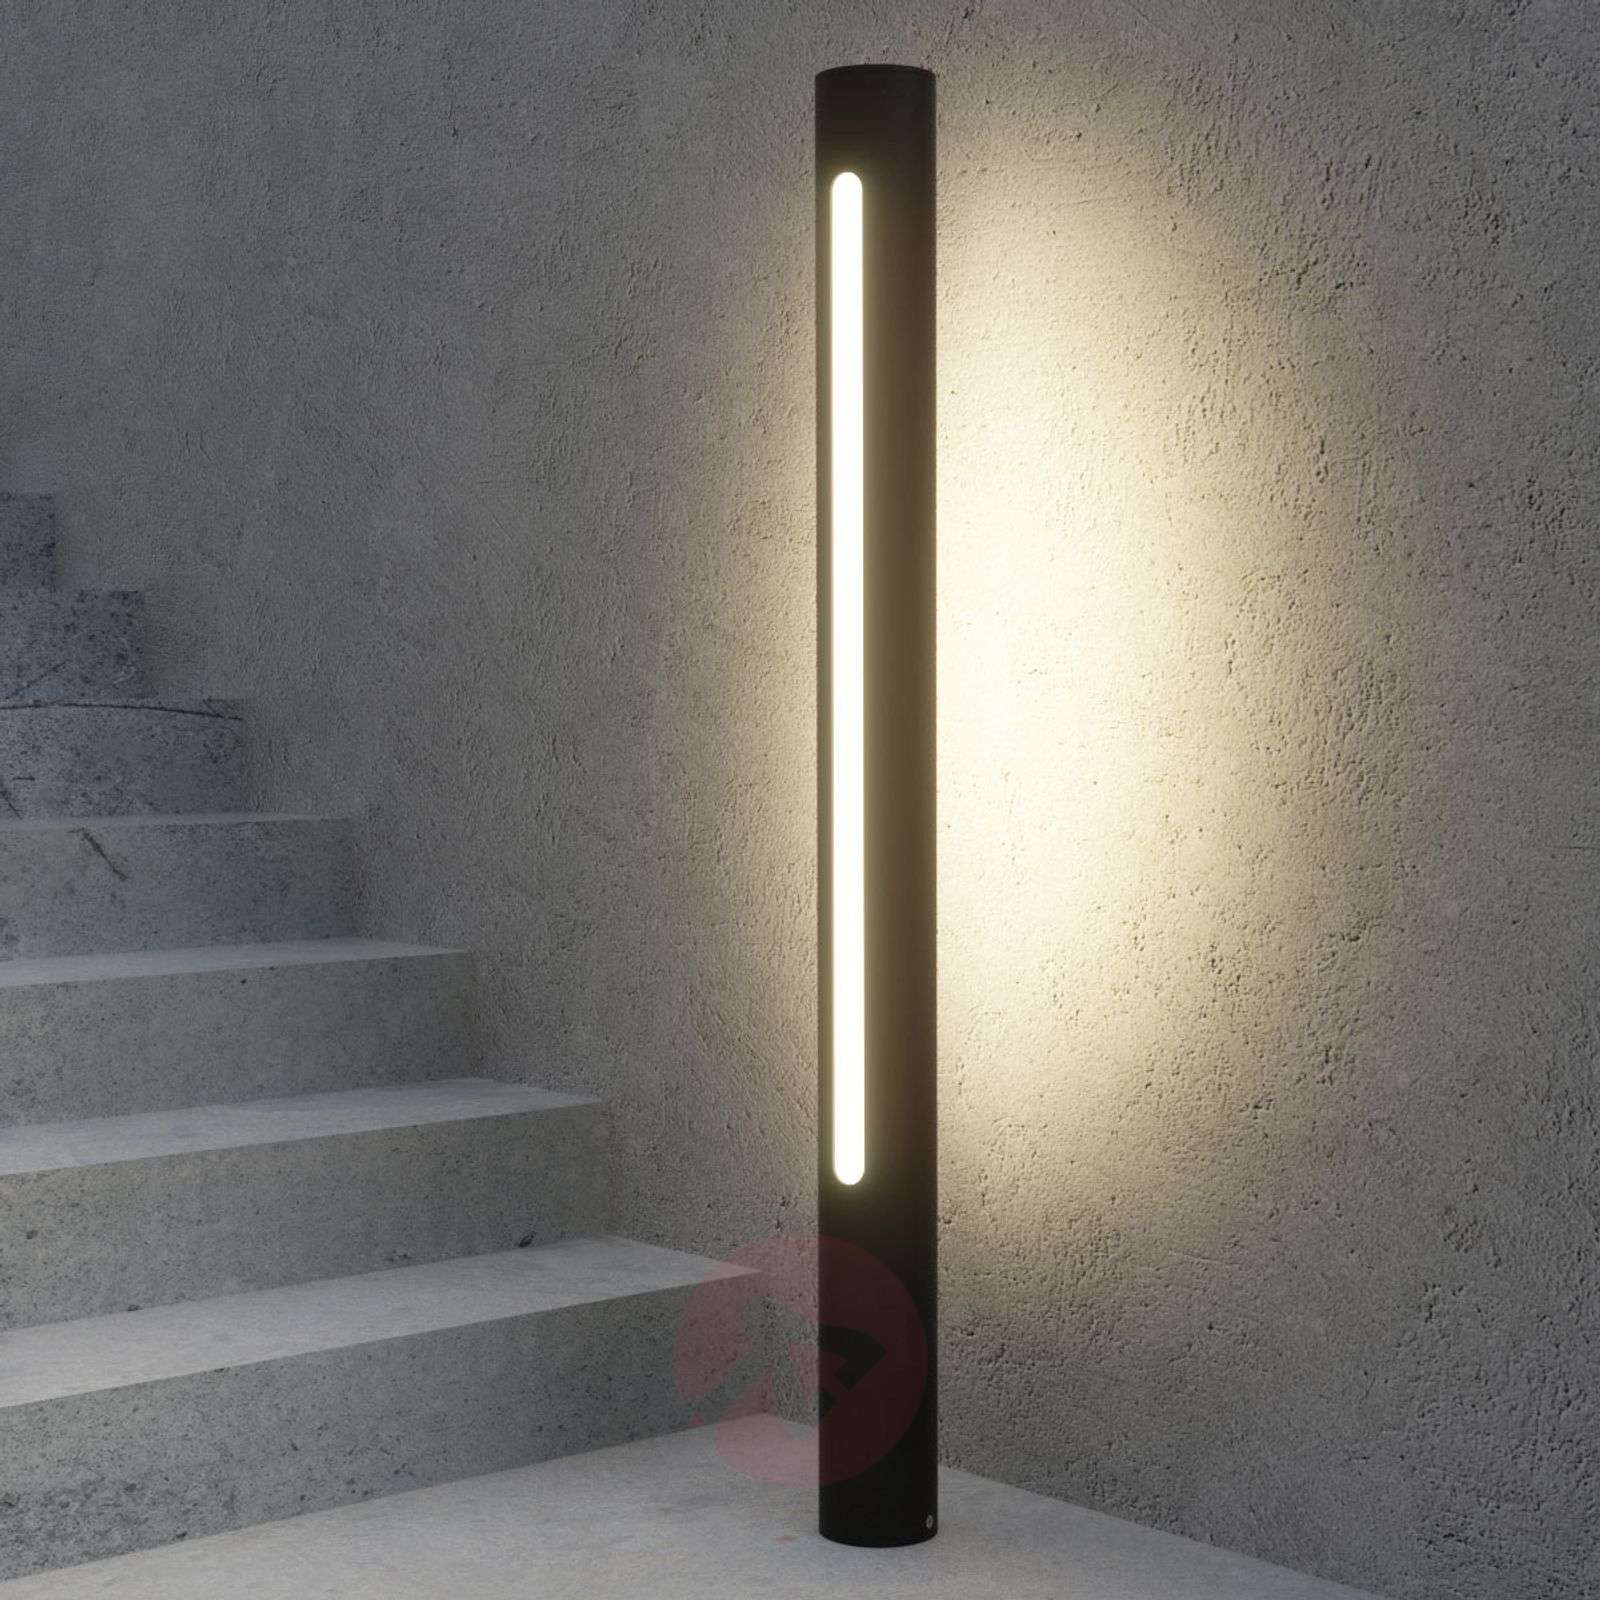 Tummanharmaa LED-pylväsvalo Tomas-9618127-02